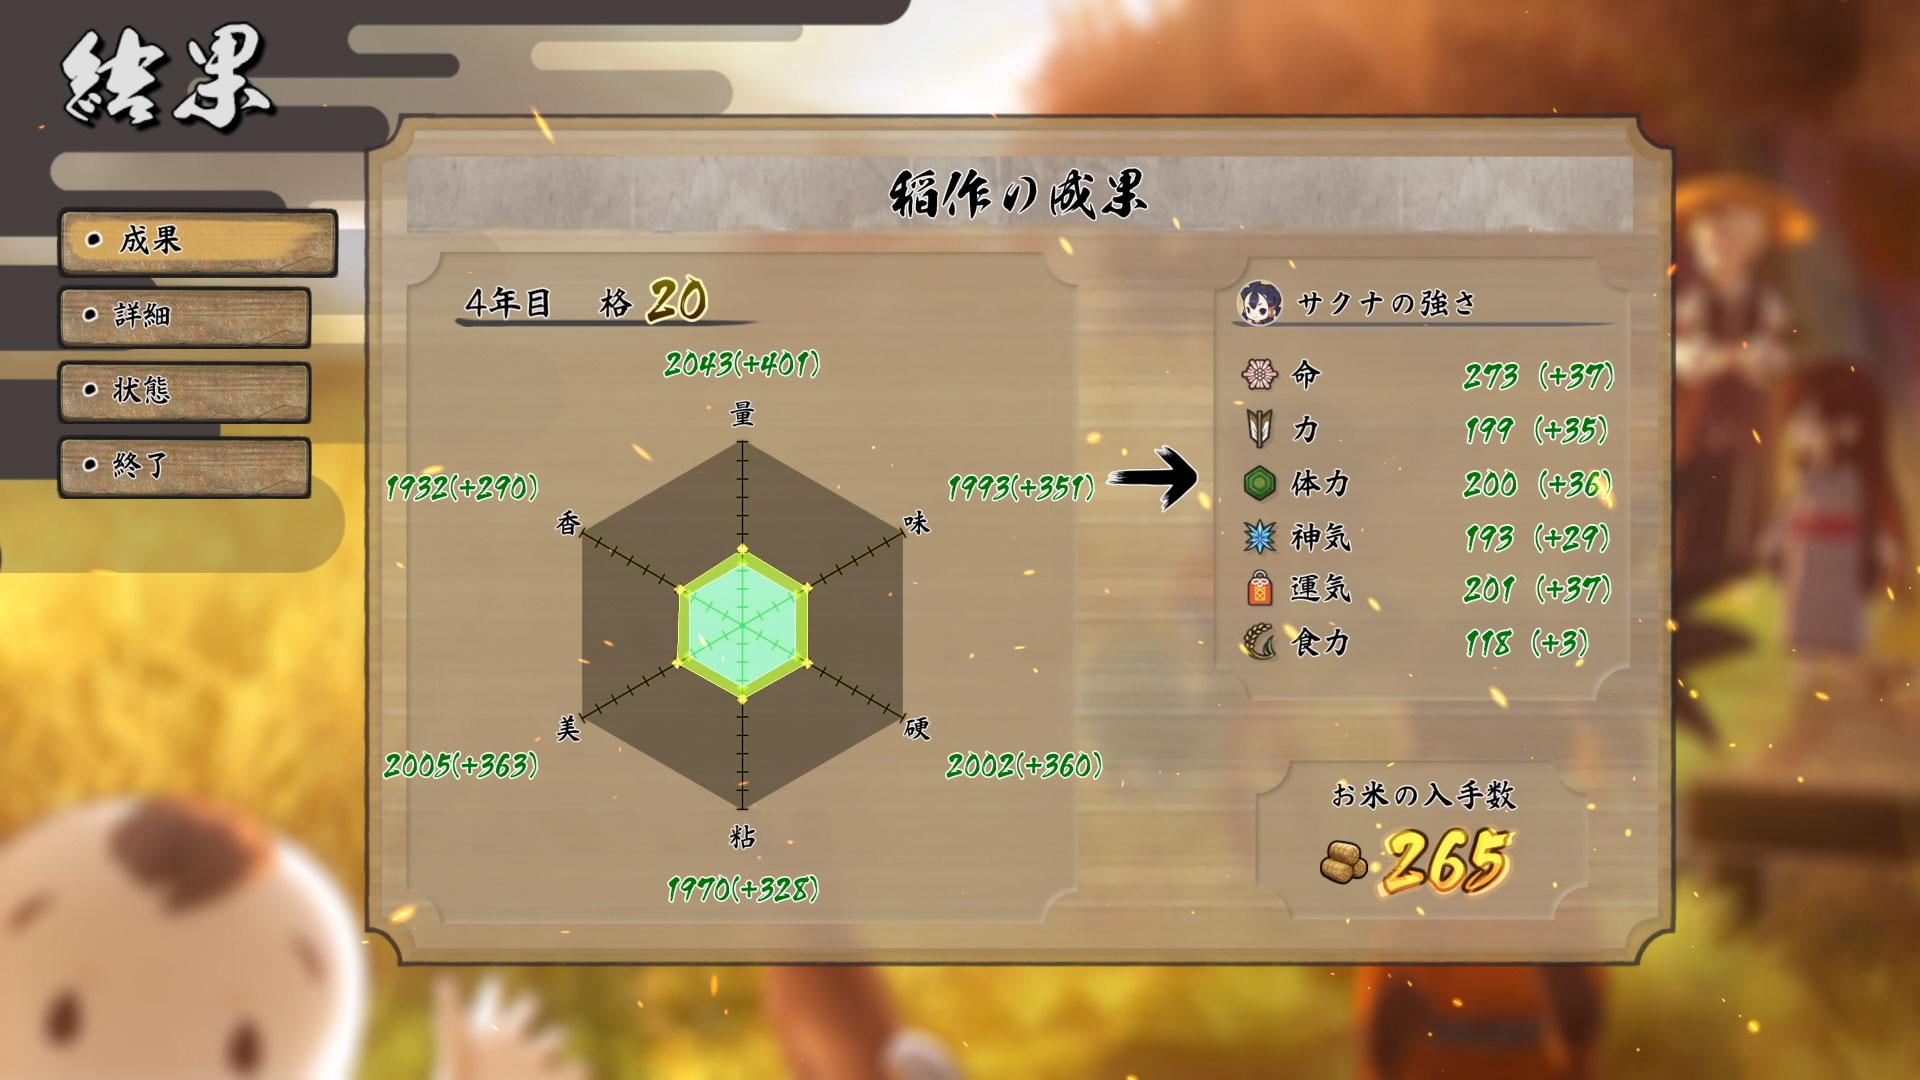 DMC v Shin Megami Tensei III a tutoriál ke Captainu Tsubasovi Sakuna Of Rice and Ruin 2020 08 11 20 019